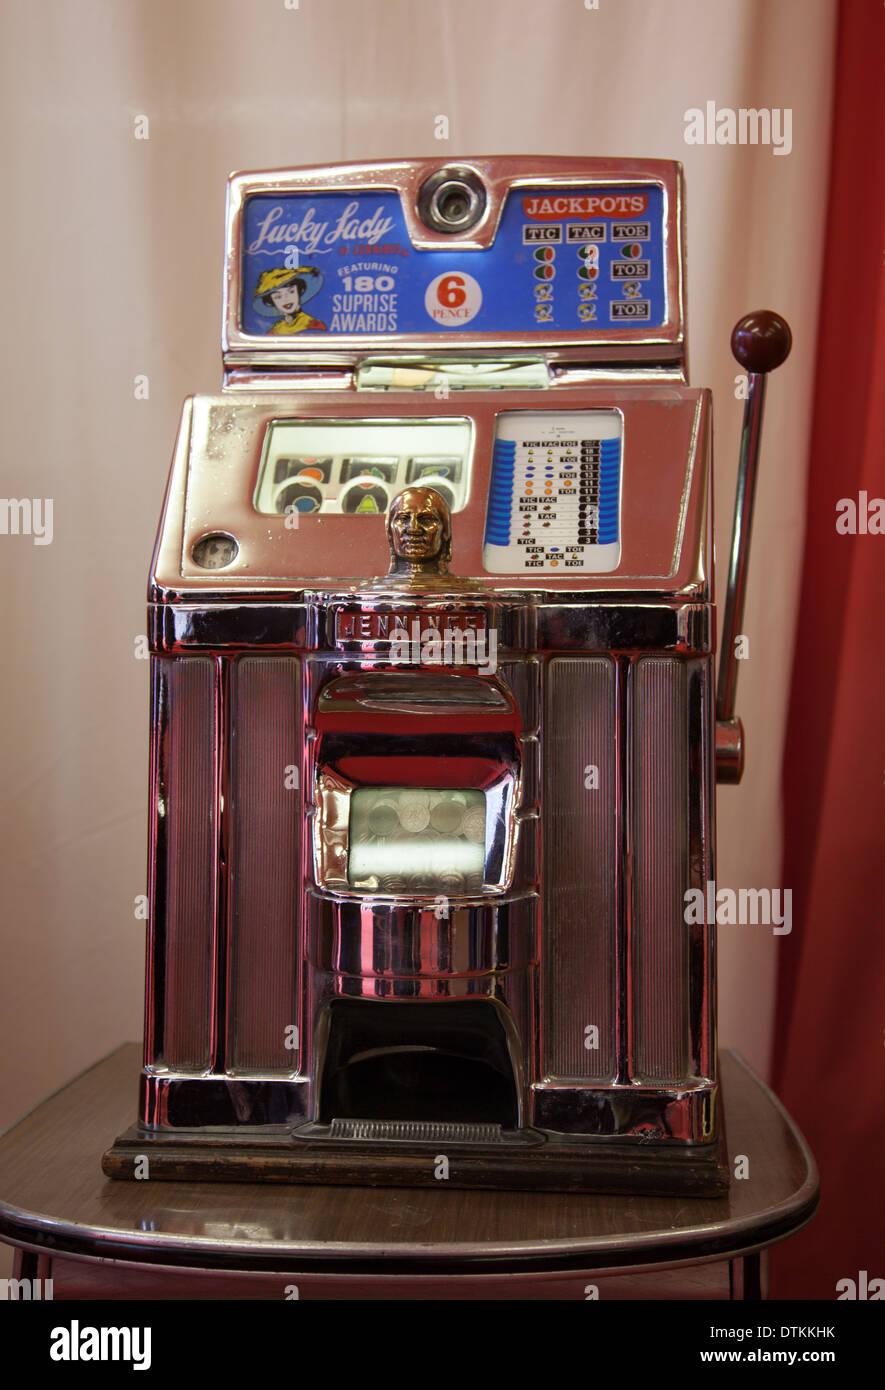 antique vintage jennings gambling slot machine lucky lady fruit